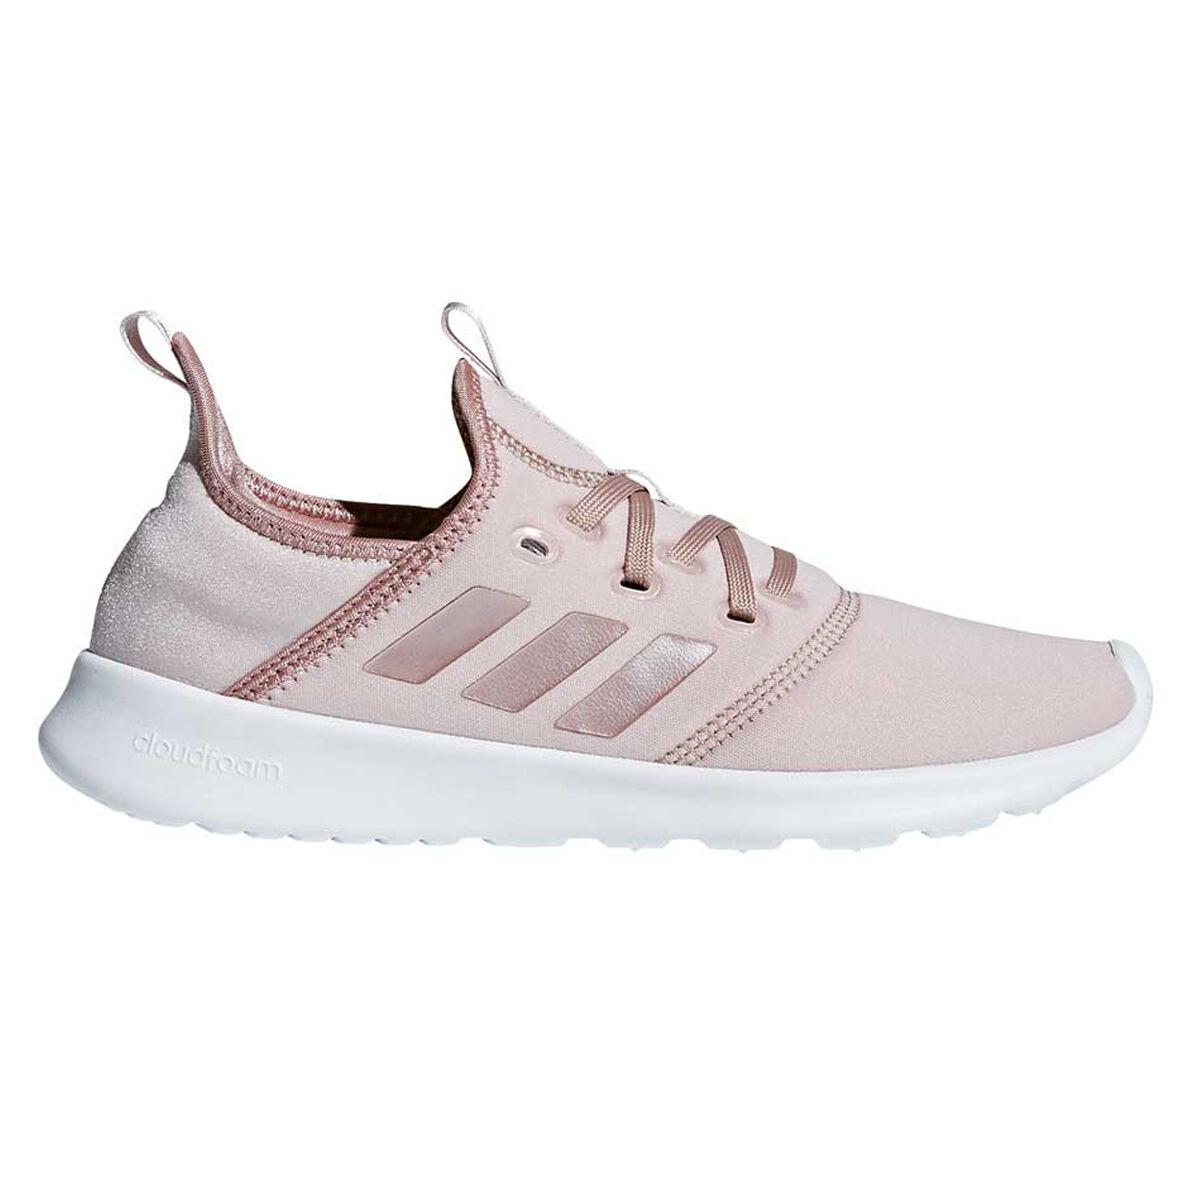 Cloudfoam Shoes for Women & Men   adidas US